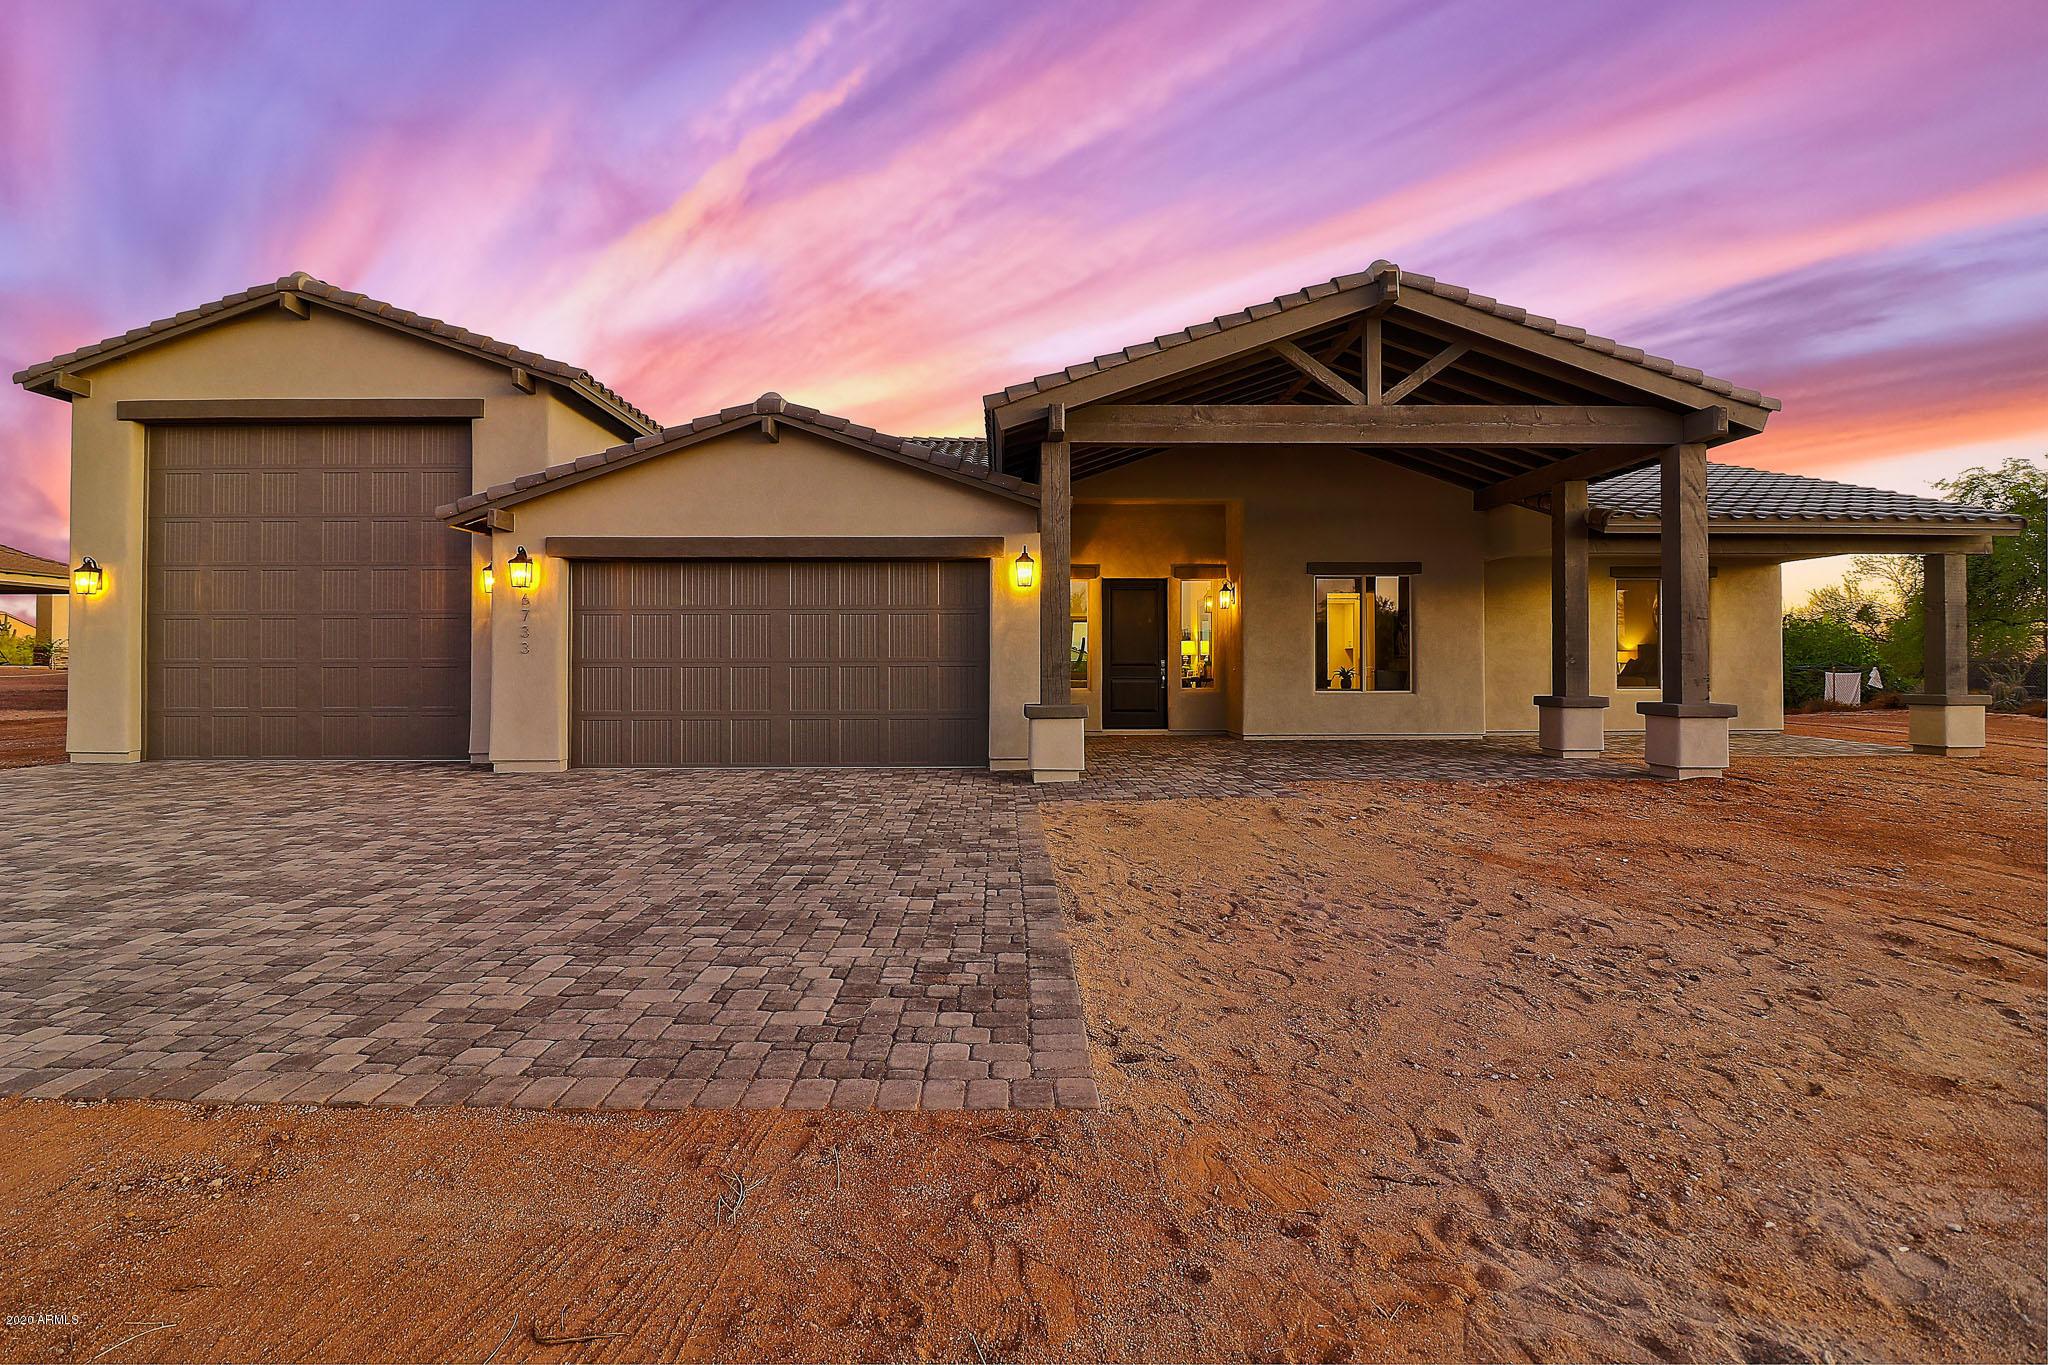 Photo of W 11th ave & Carlise, Lot 1 Road, Phoenix, AZ 85086